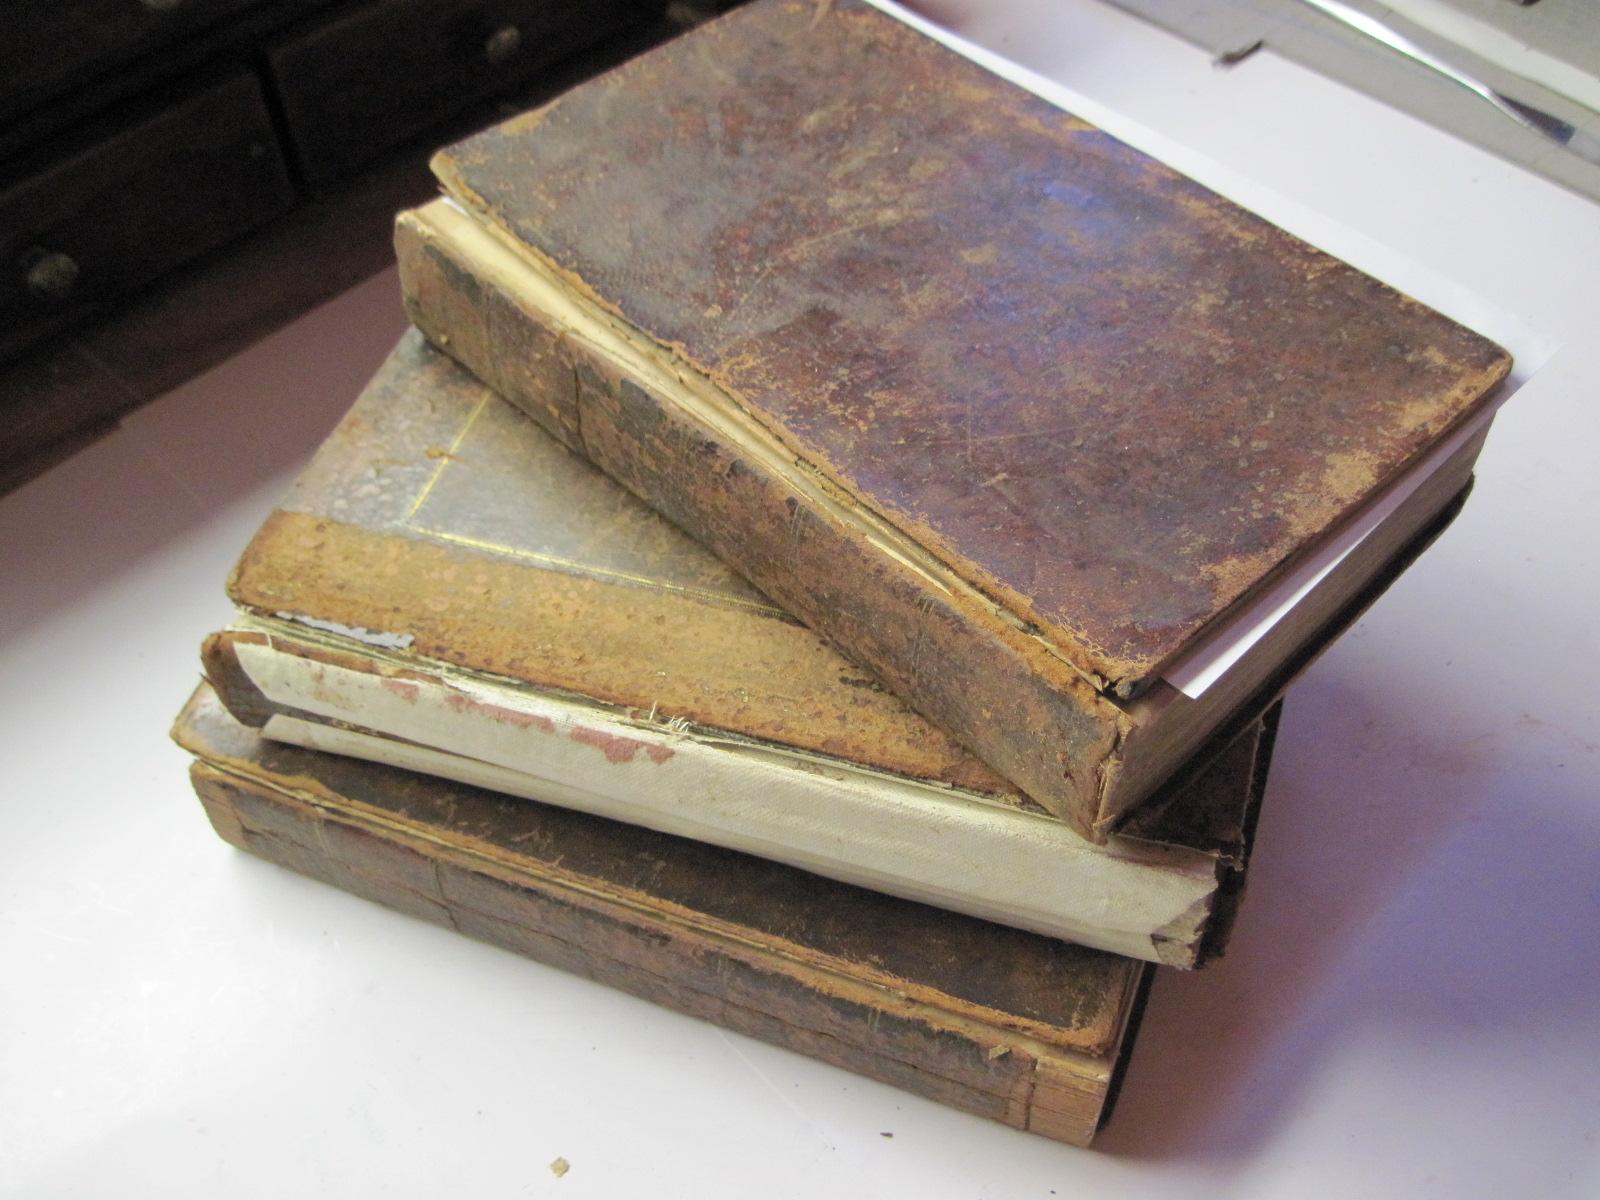 Fine Book Binding and Restoration: Restoration of Rare Historical Books